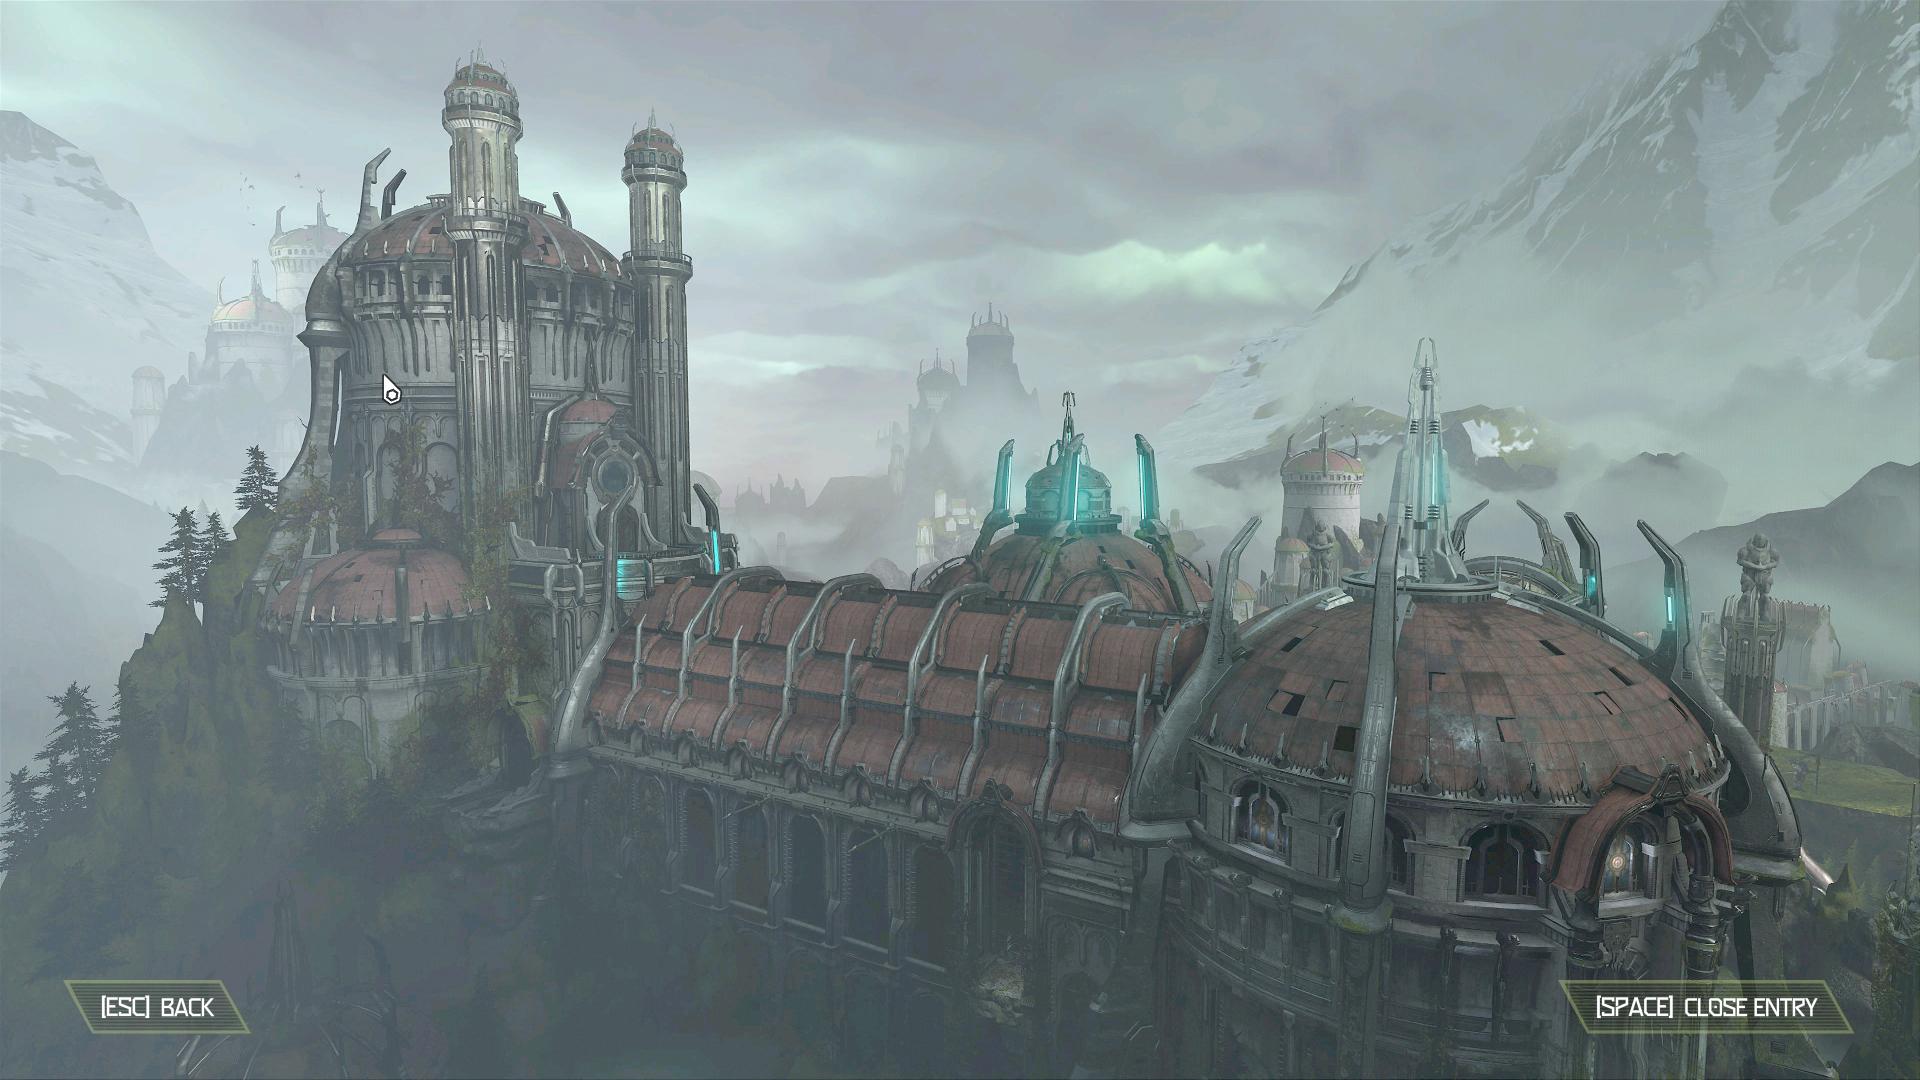 The Cultist Base in Doom Eternal